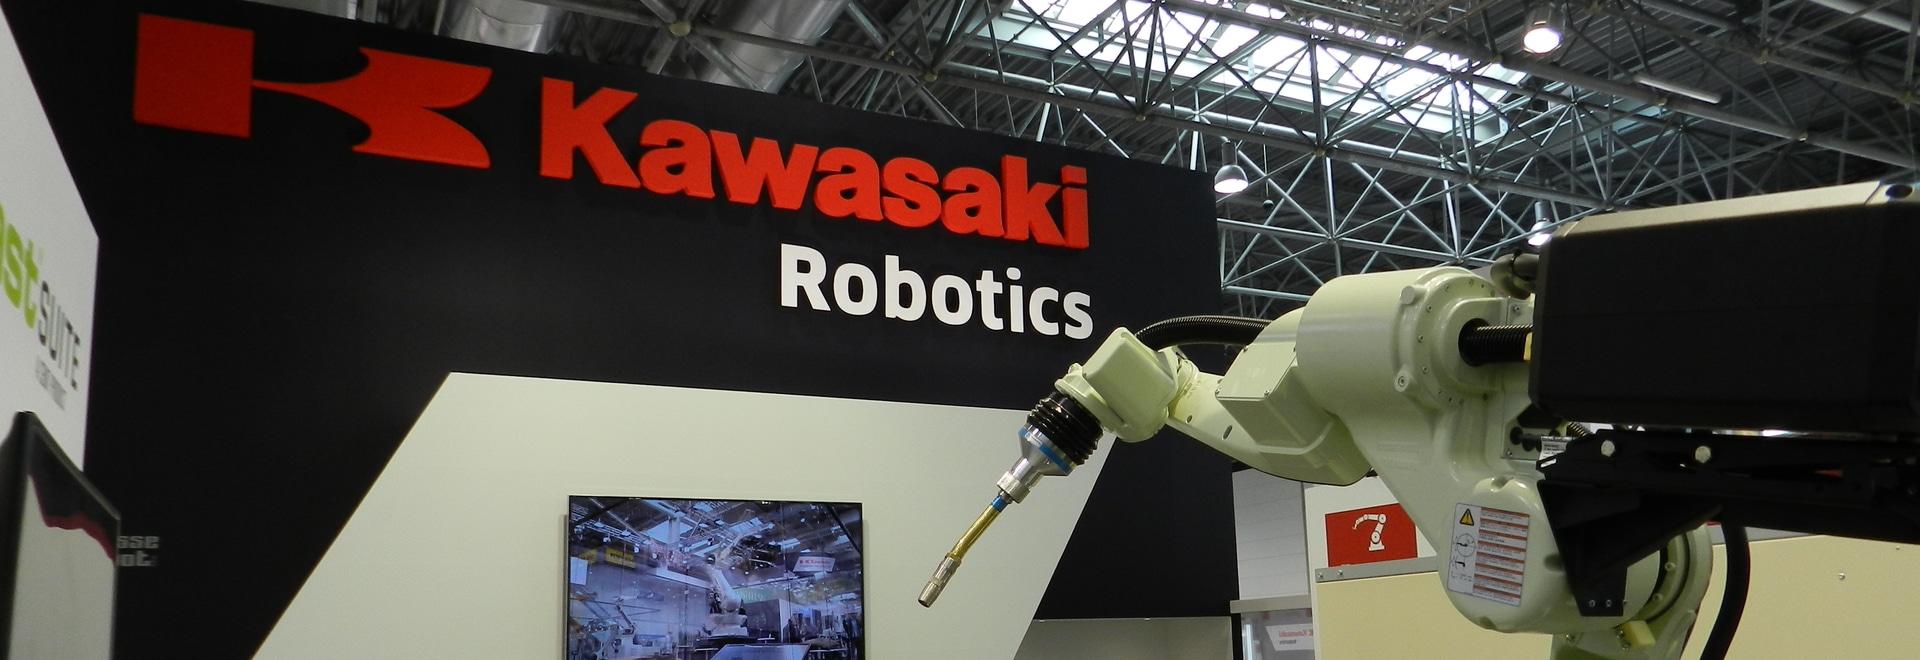 Kawasaki Arc Welding Robot BA006L at Schweißen & Schneiden 2017